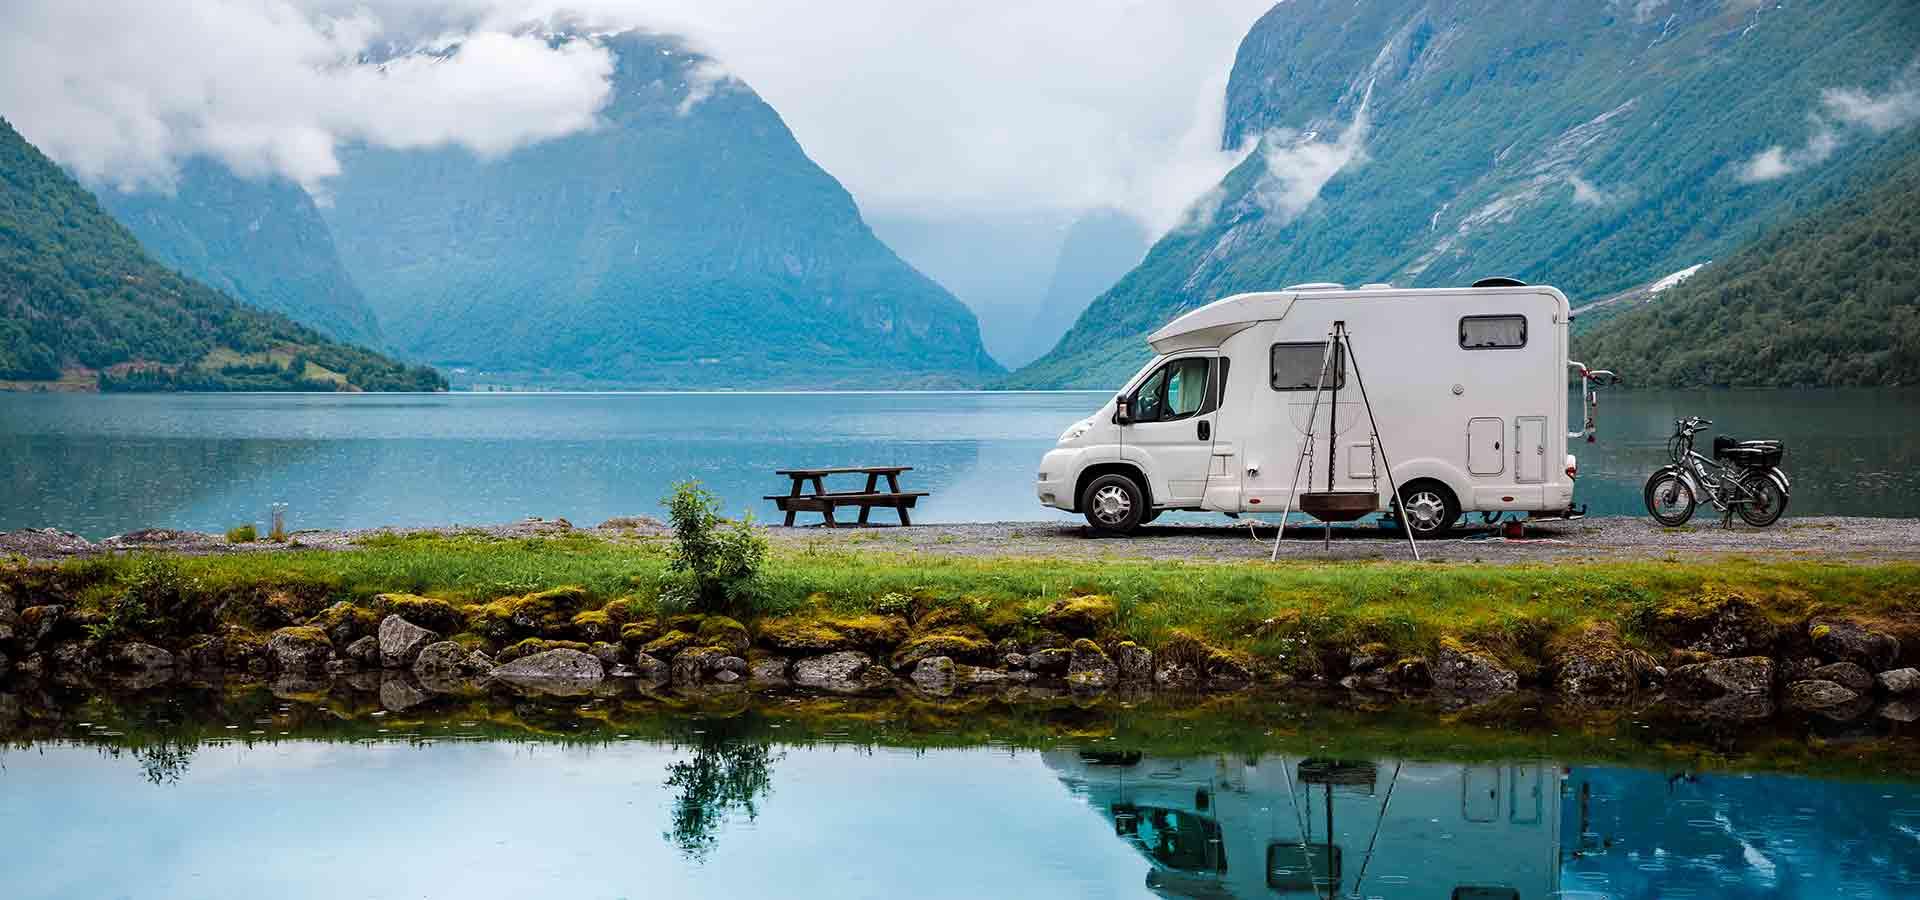 Steve Barnett Caravan & Motorhome Services & Repairs Specialists